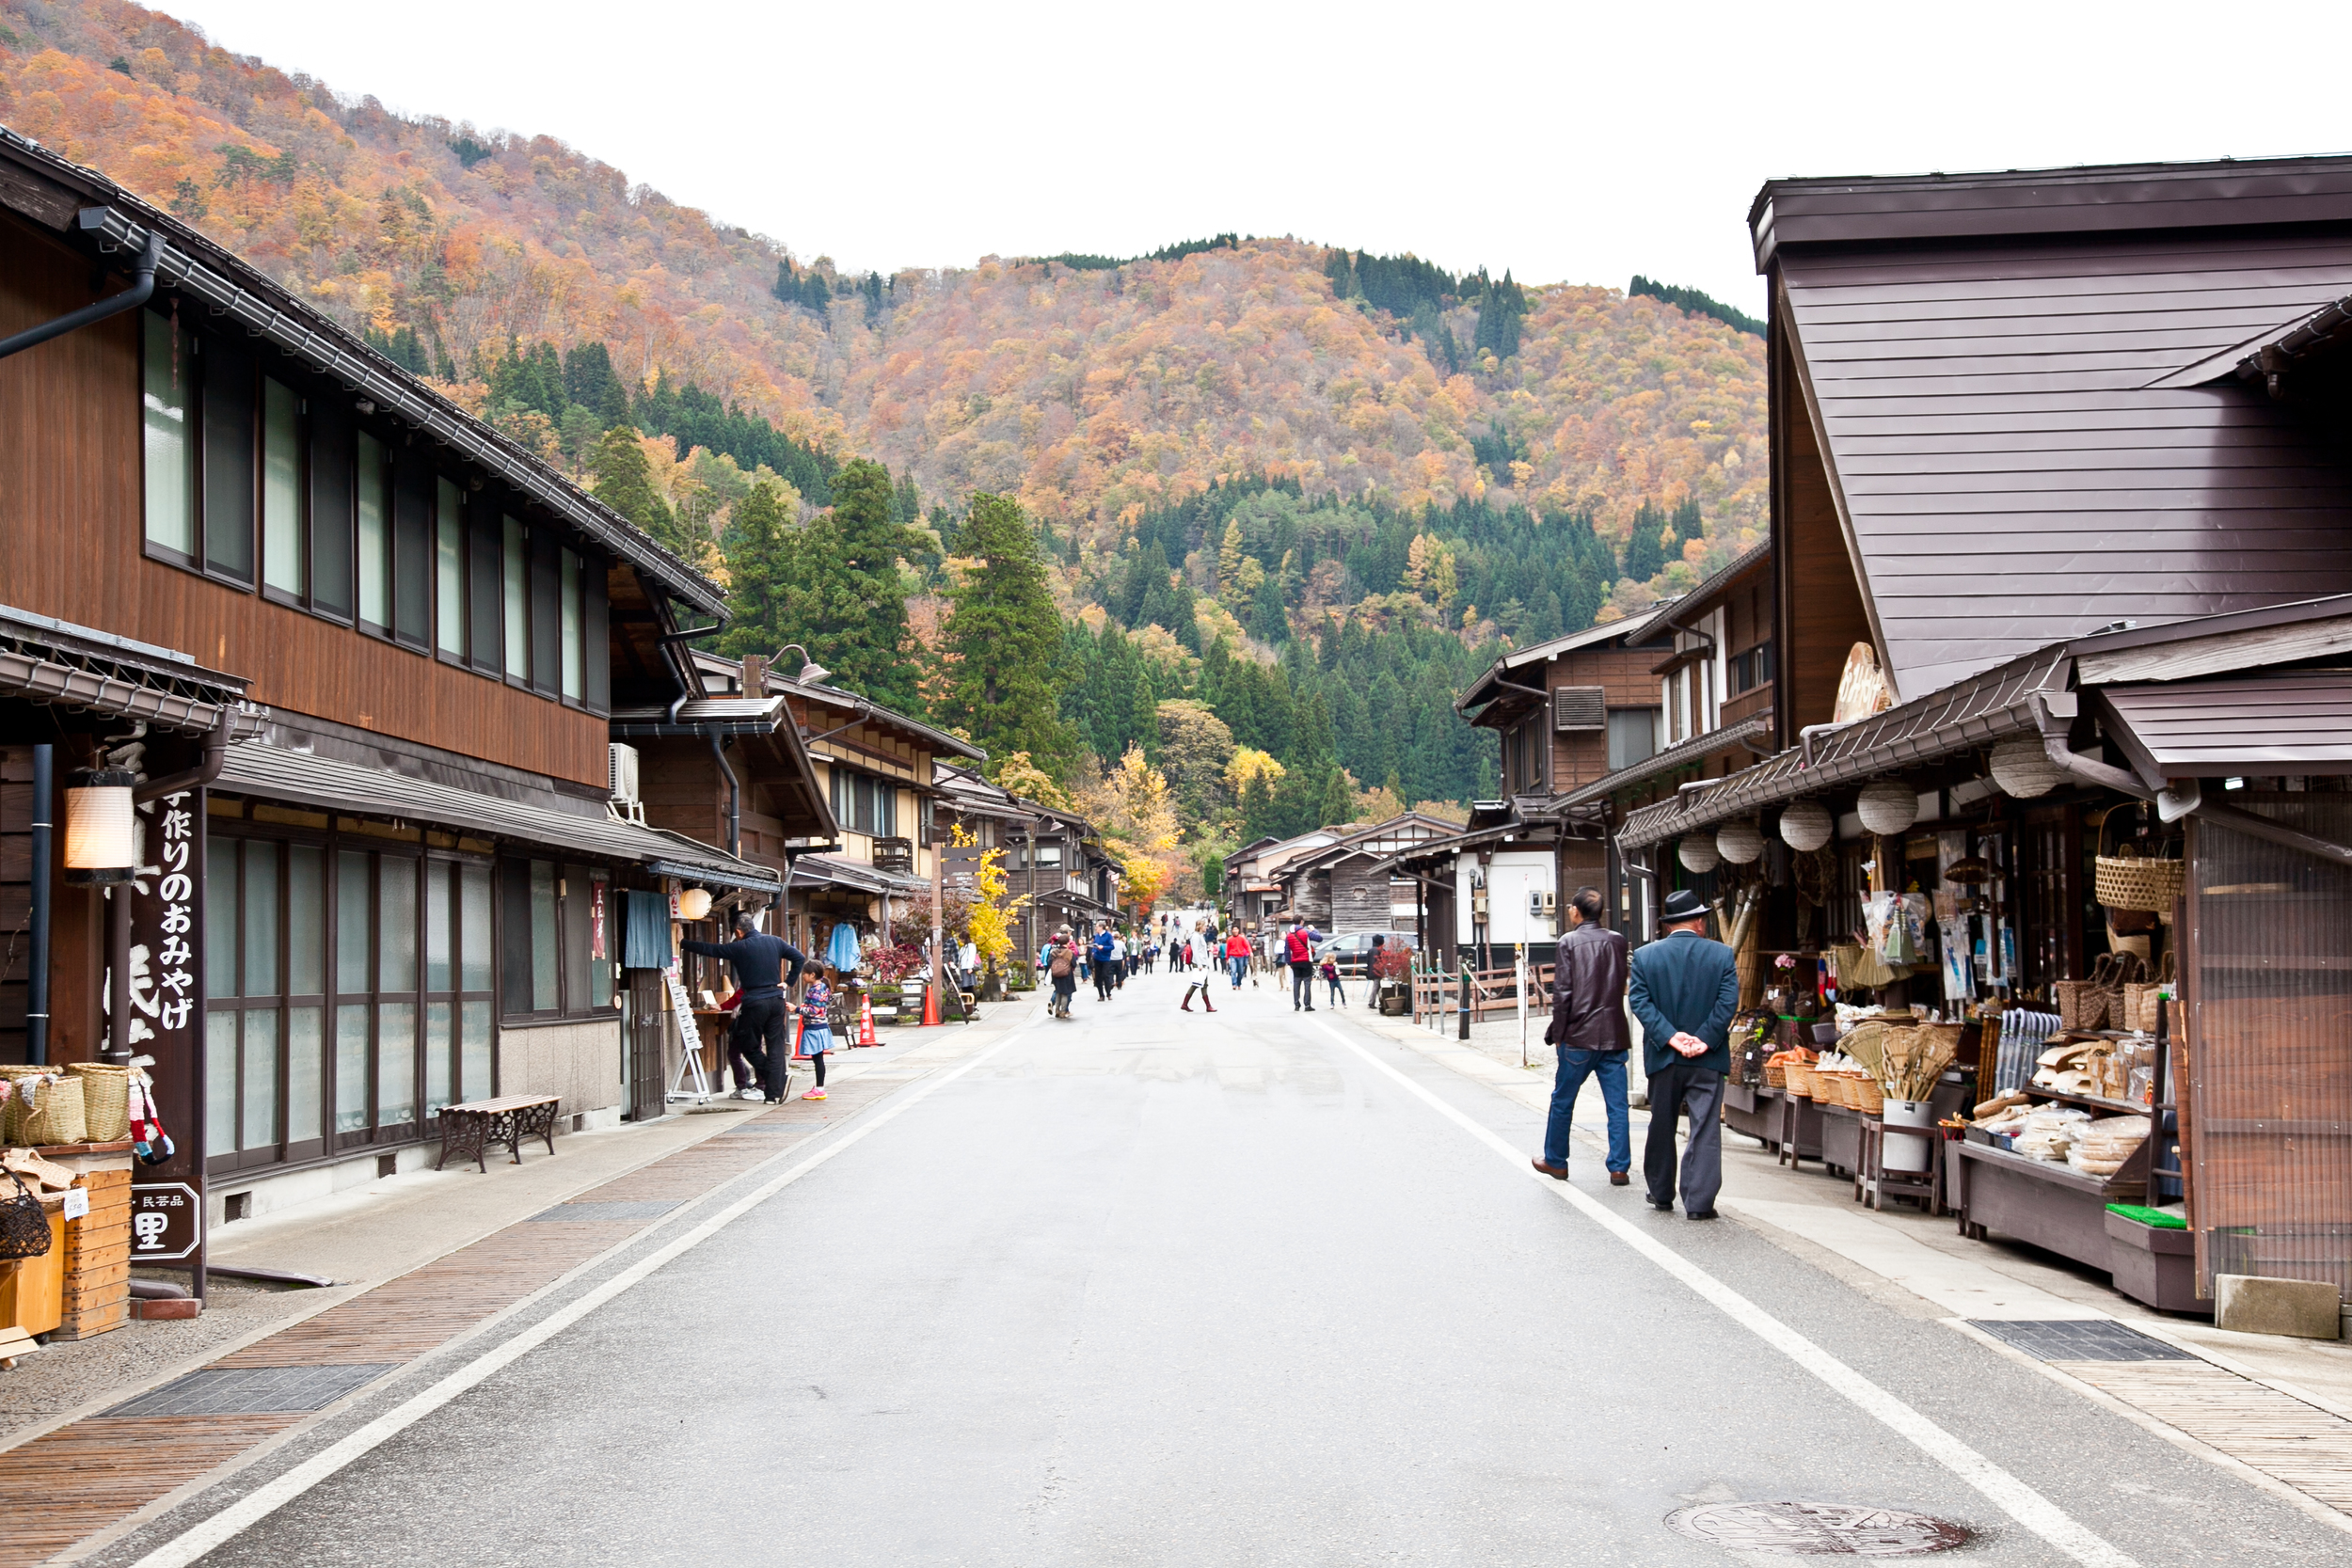 IMG_6950-shirakawa-go-takayama-japan-alps-trisa-taro.jpg